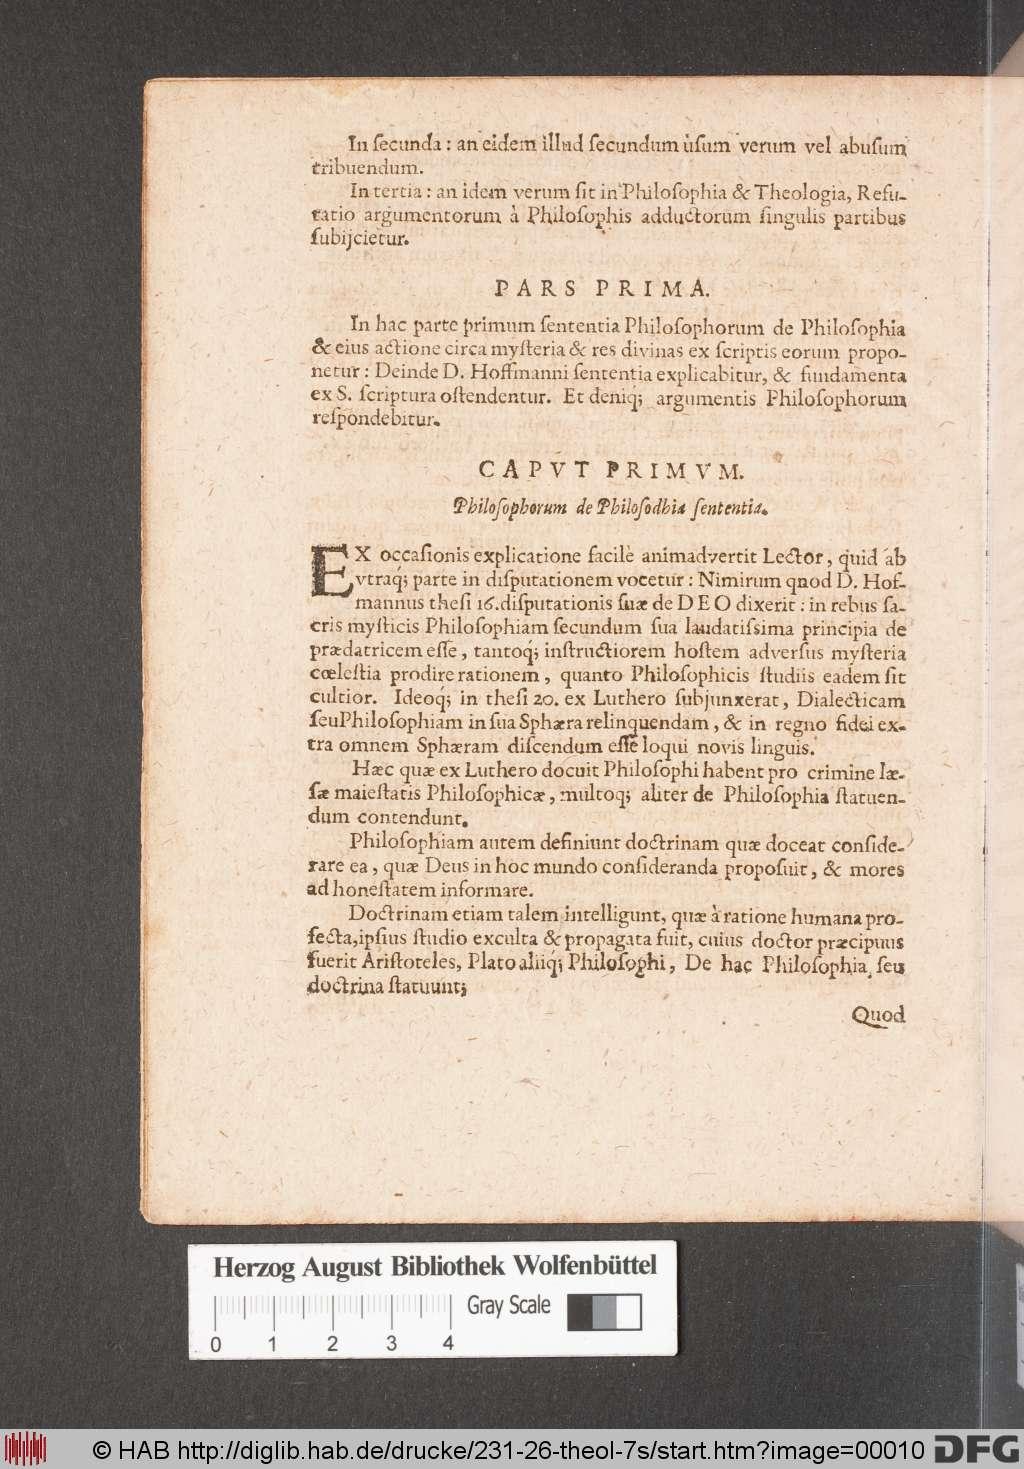 http://diglib.hab.de/drucke/231-26-theol-7s/00010.jpg